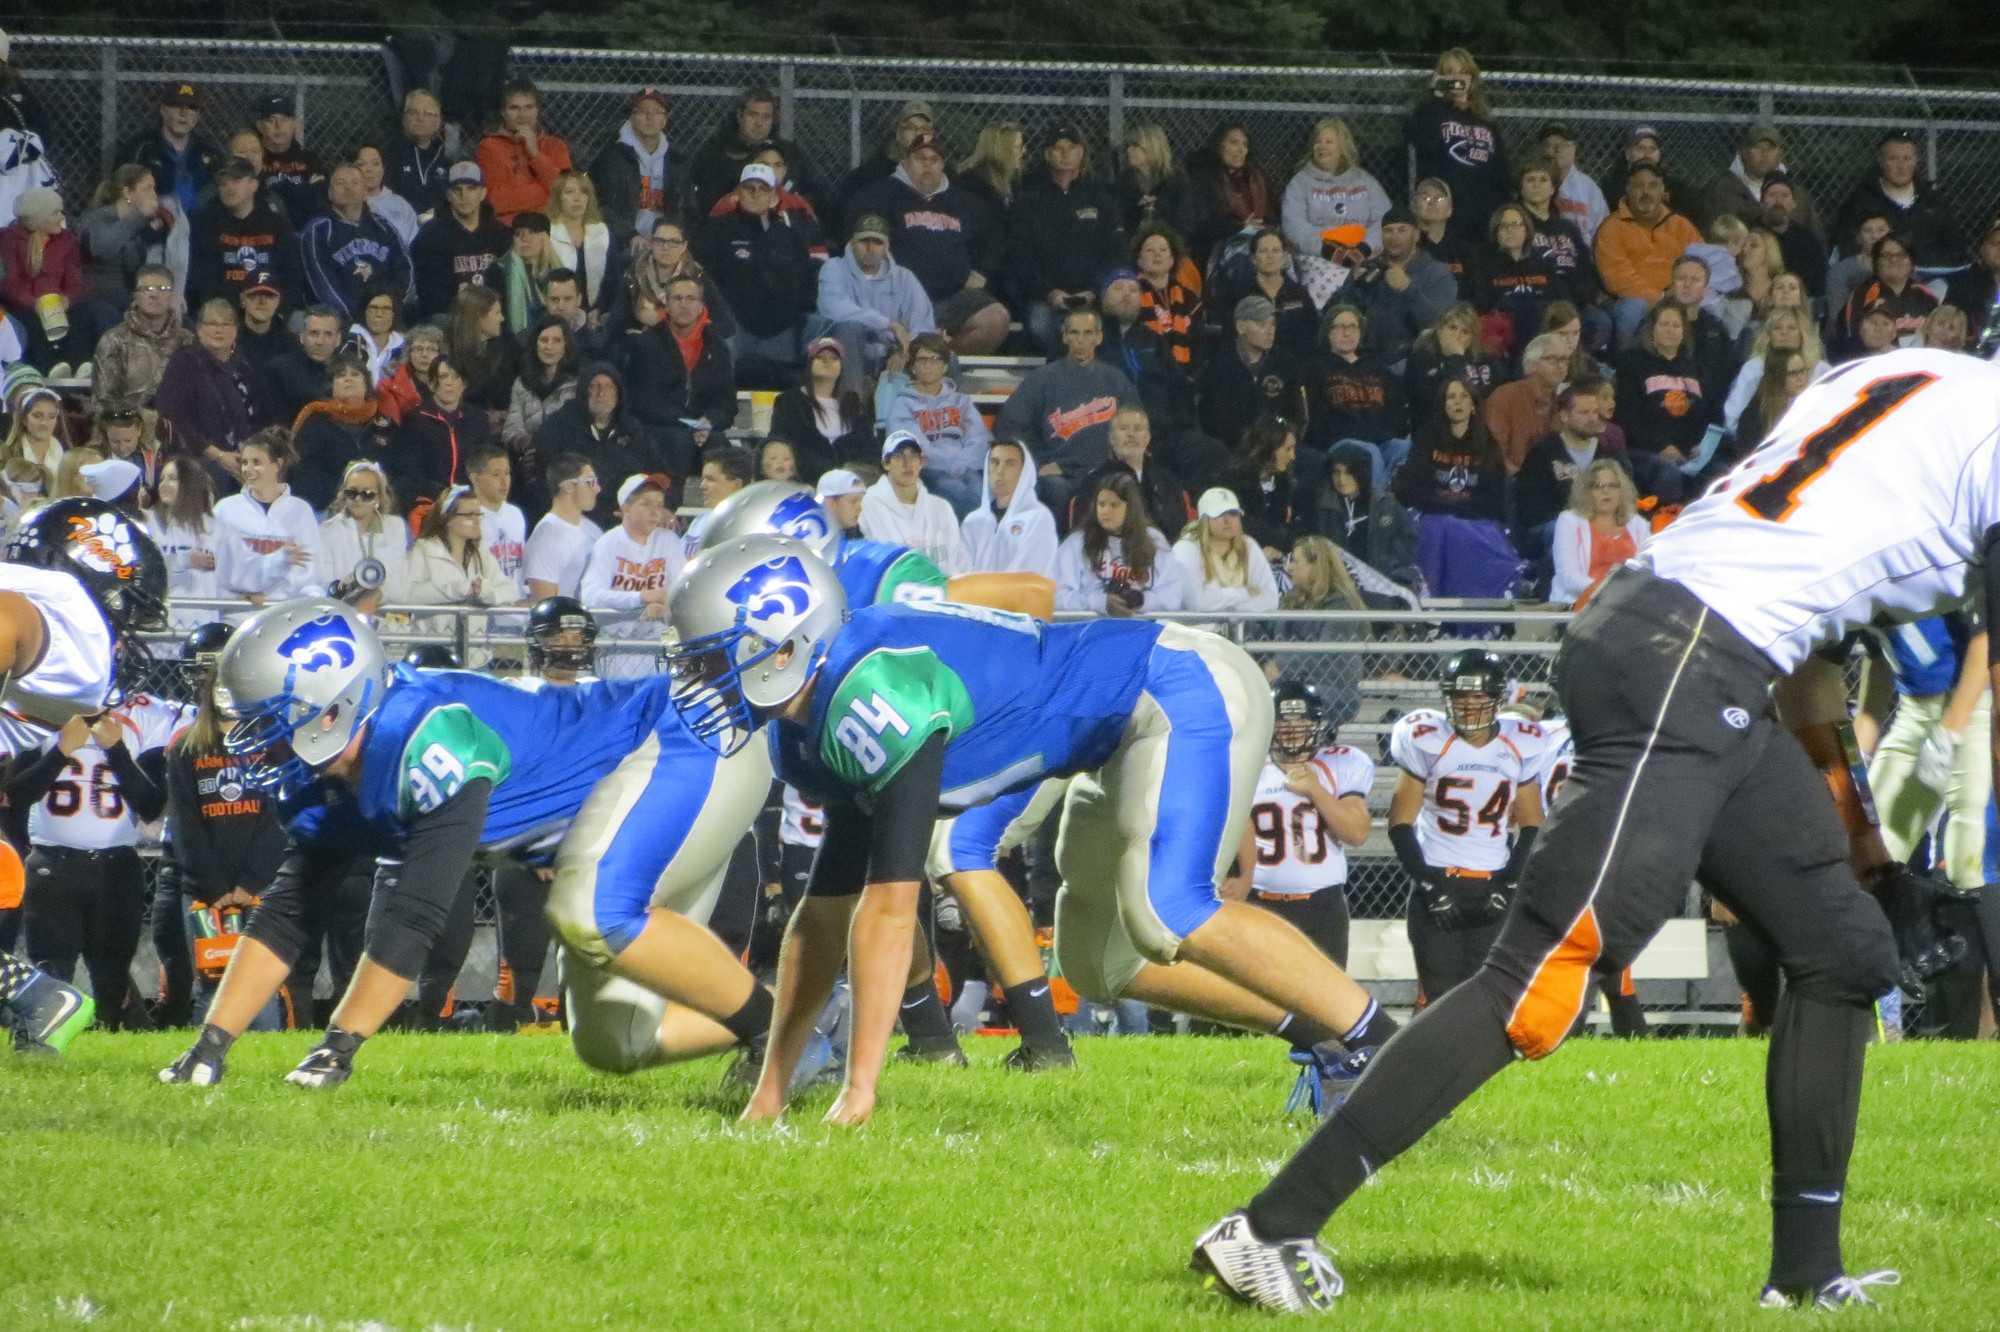 Josh Kawlewski and Wyatt Glienke on the defensive line